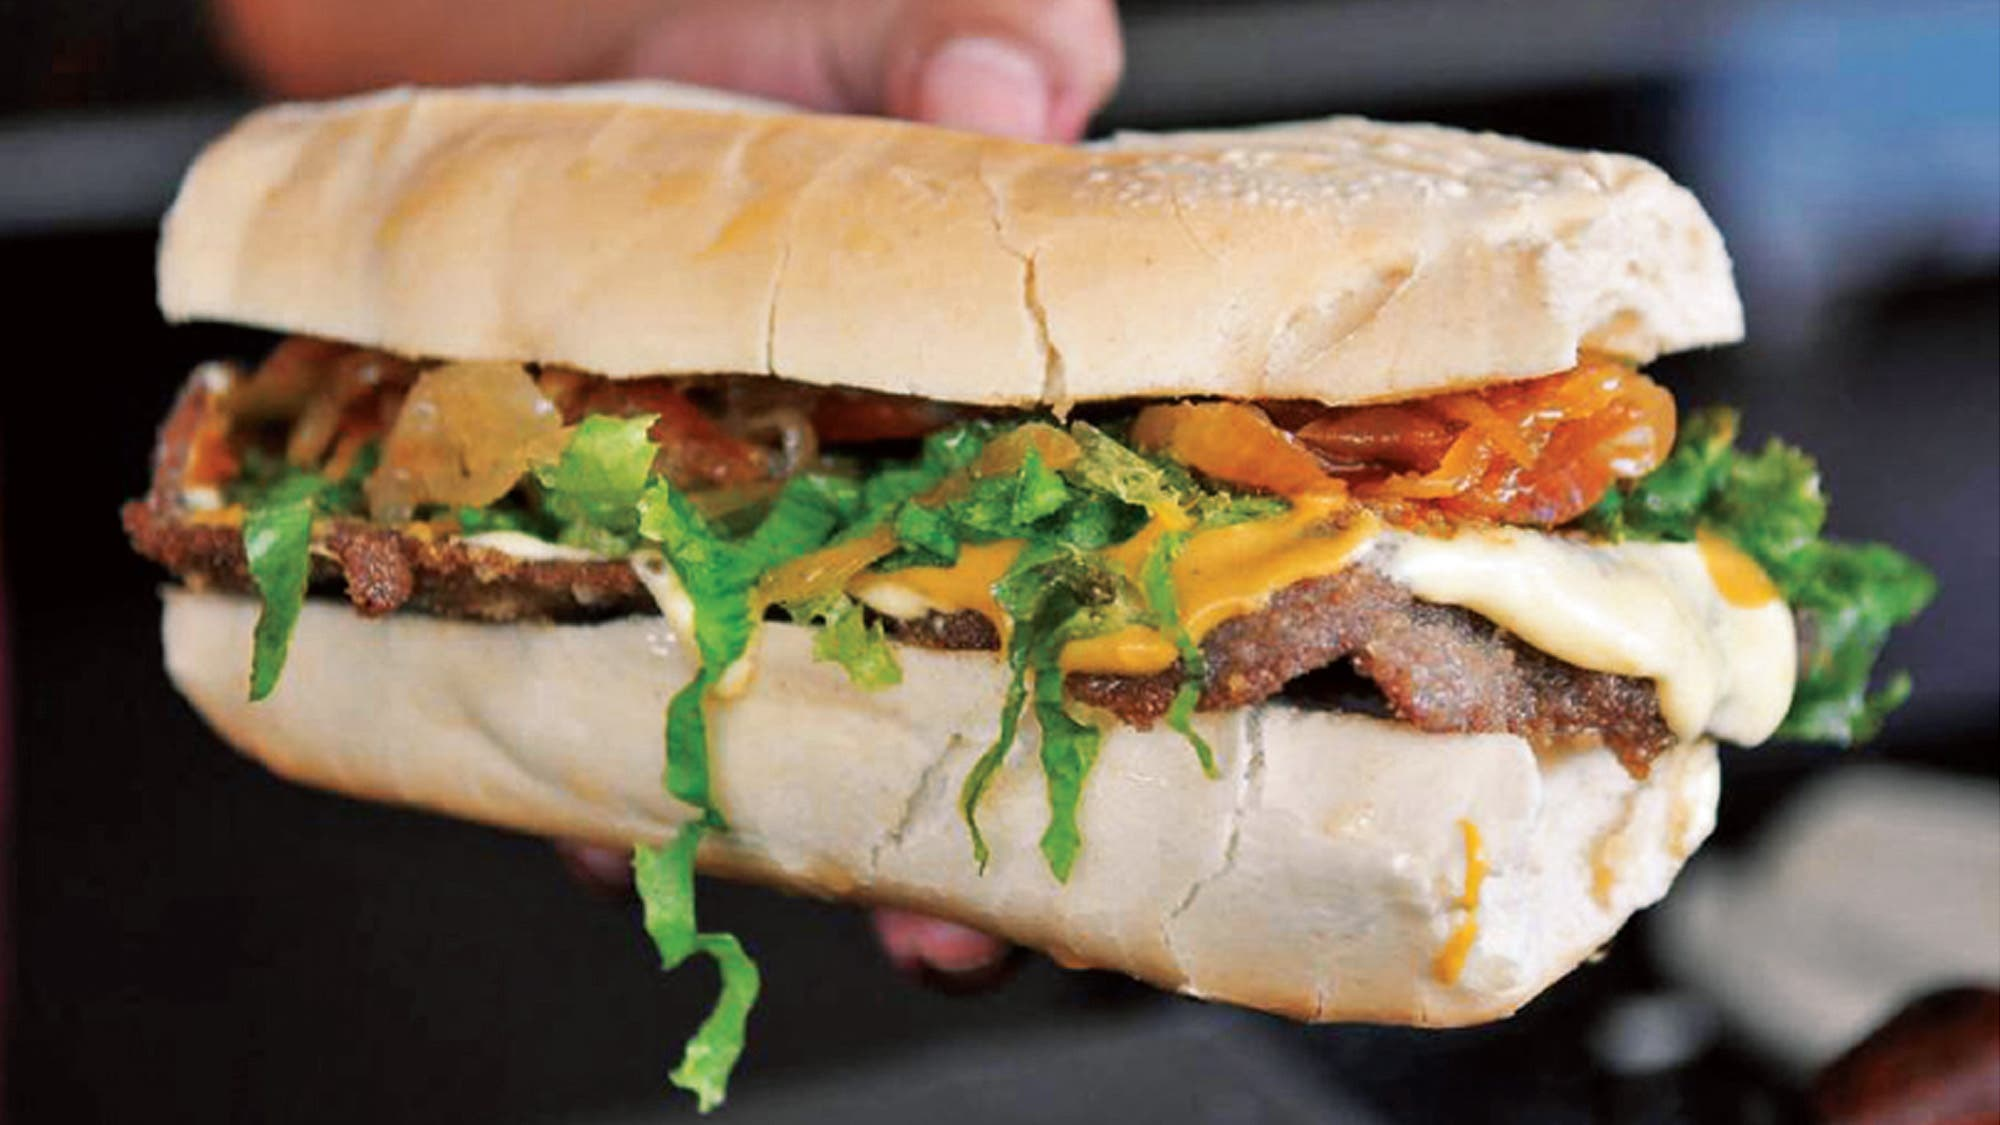 Resultado de imagen para tucuman sandwicheria don pepe